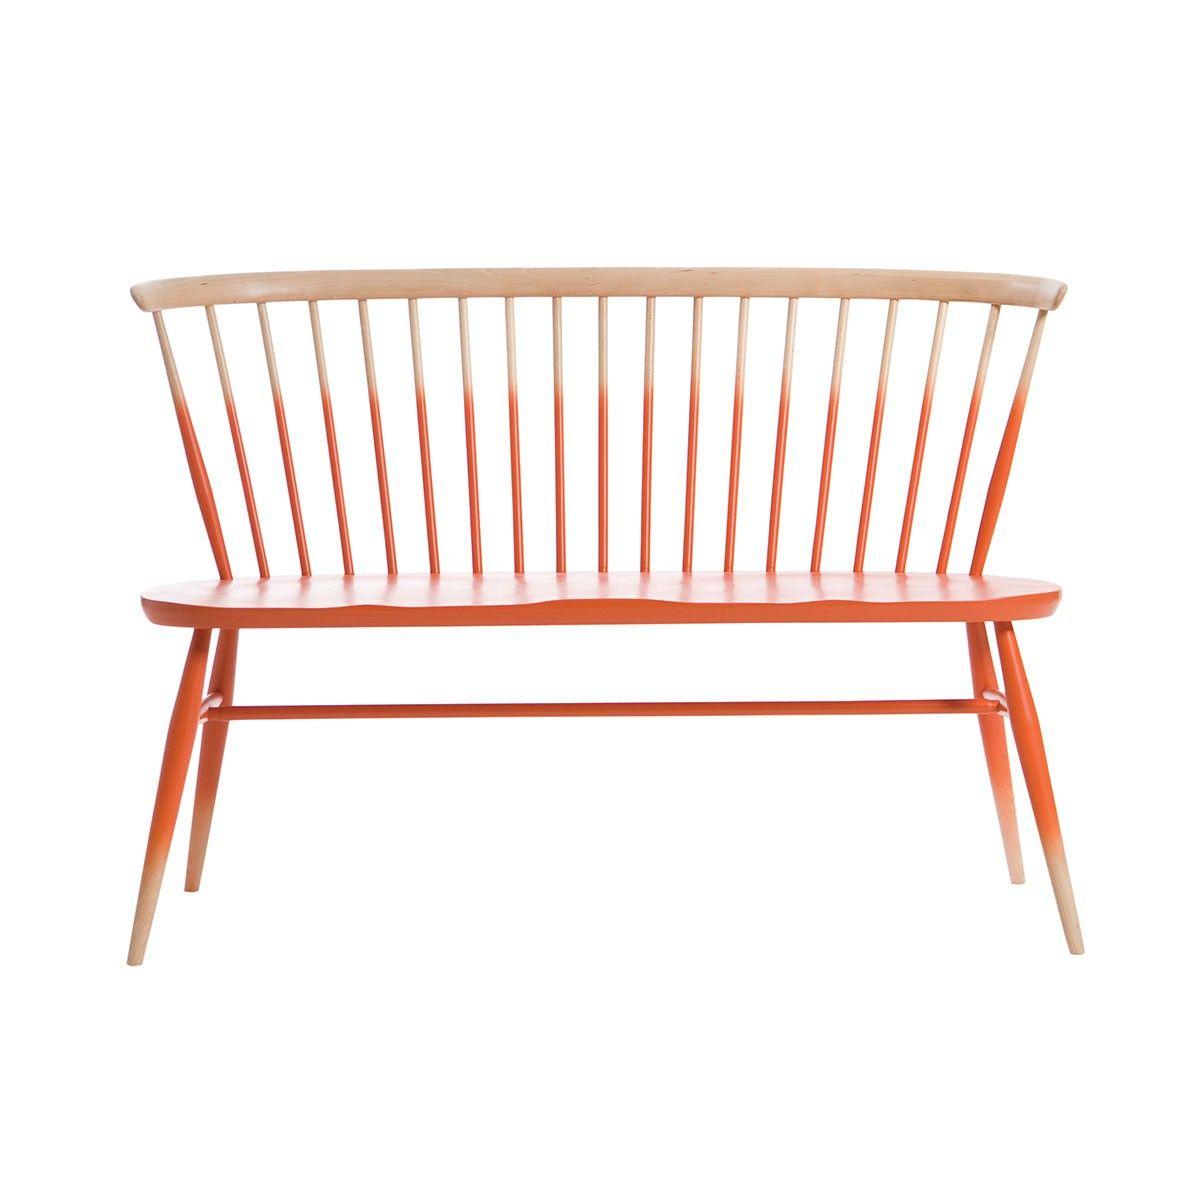 Banc tie and dye / Love Seat - Orange